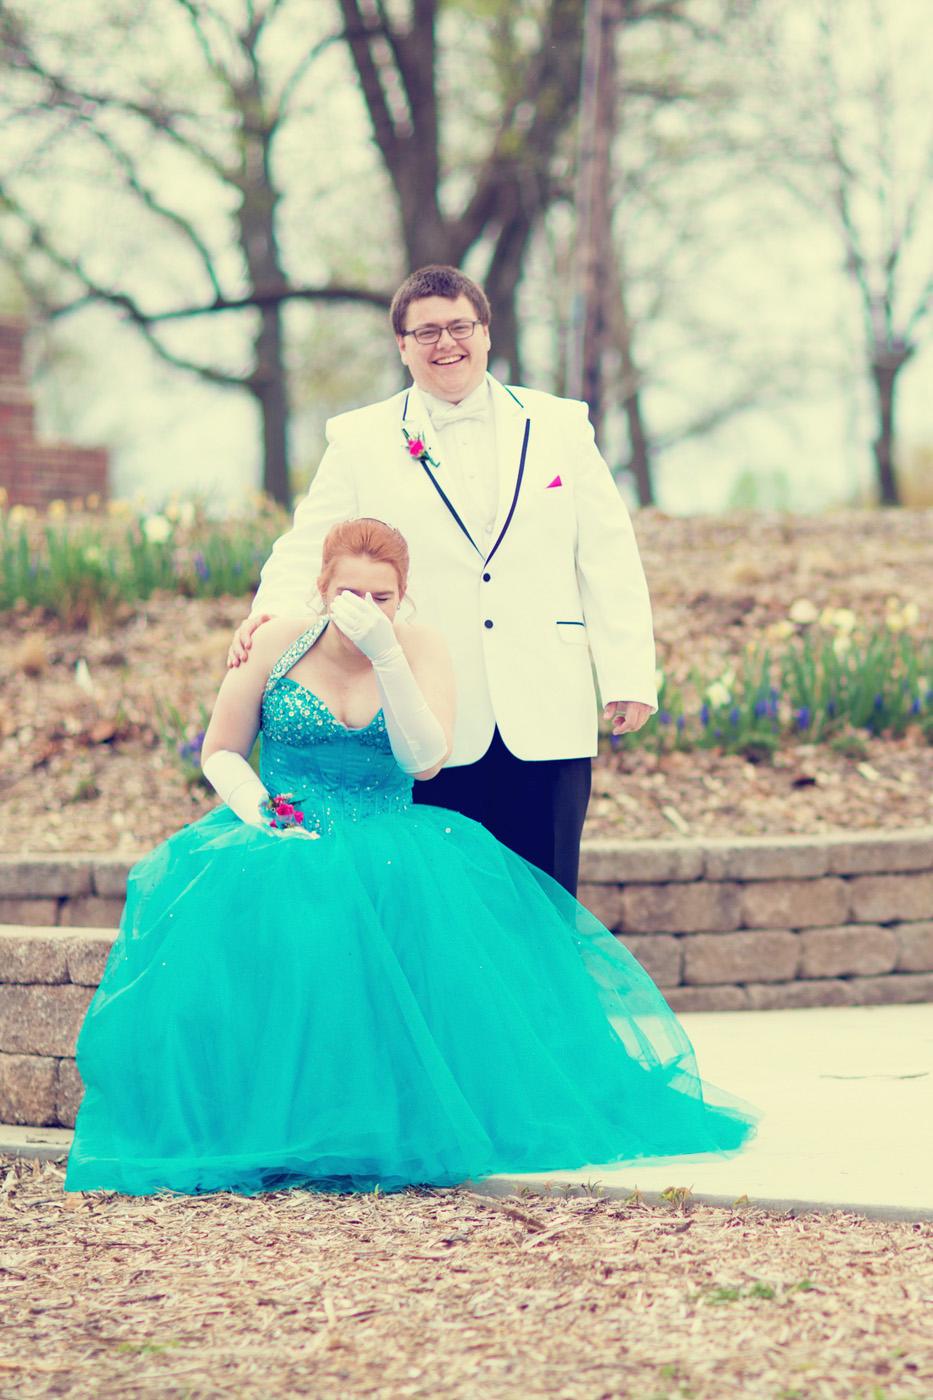 Garrett & Helen Prom 2014 166_1.jpg